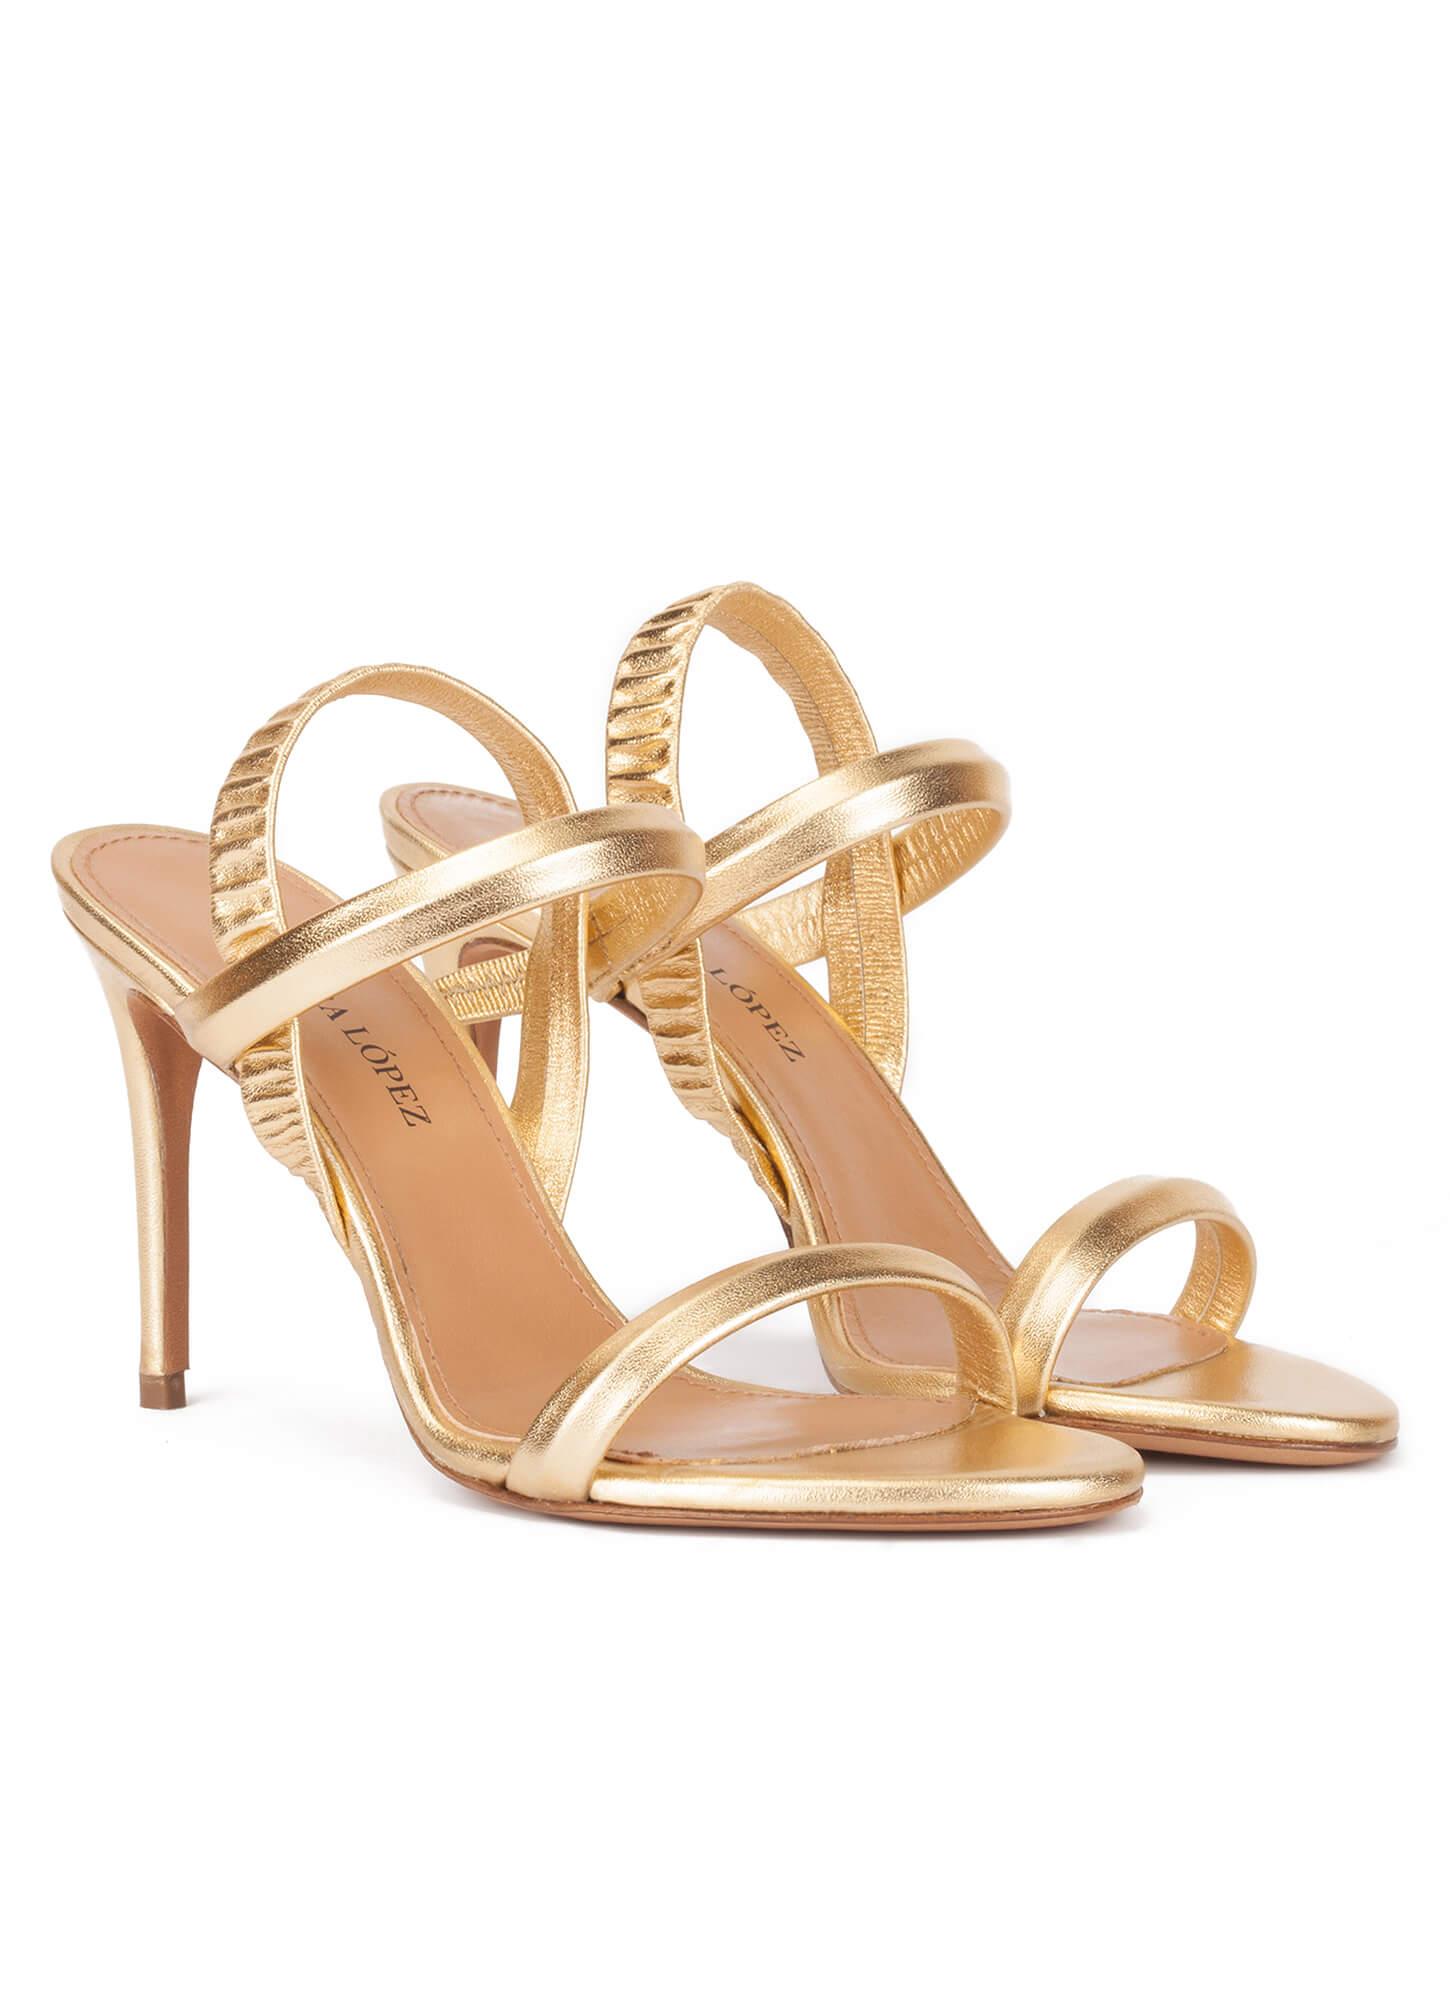 c64bf4c8b8 Ornella Pura López. High stiletto heel sandals in gold leather High  stiletto heel sandals in gold leather ...